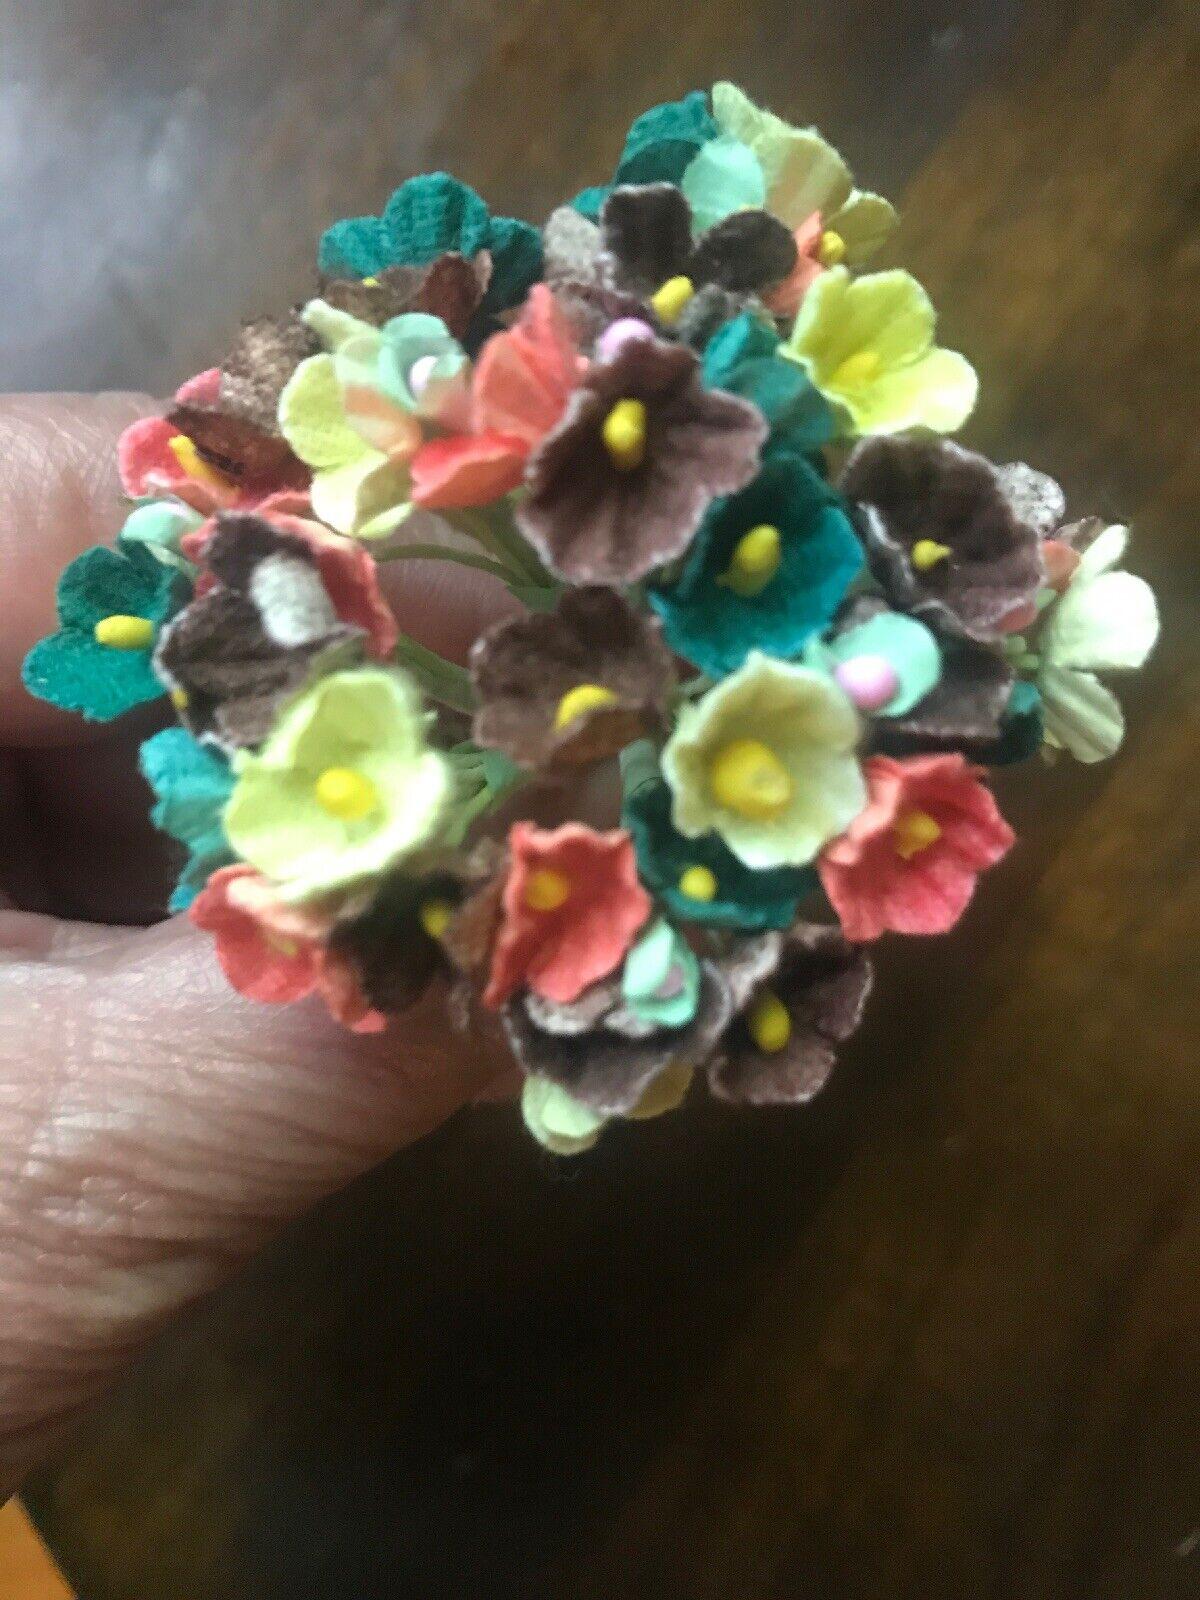 Millinery Flower Black Heather 12 stem Bunch for Hat Wedding Hair NQ2a